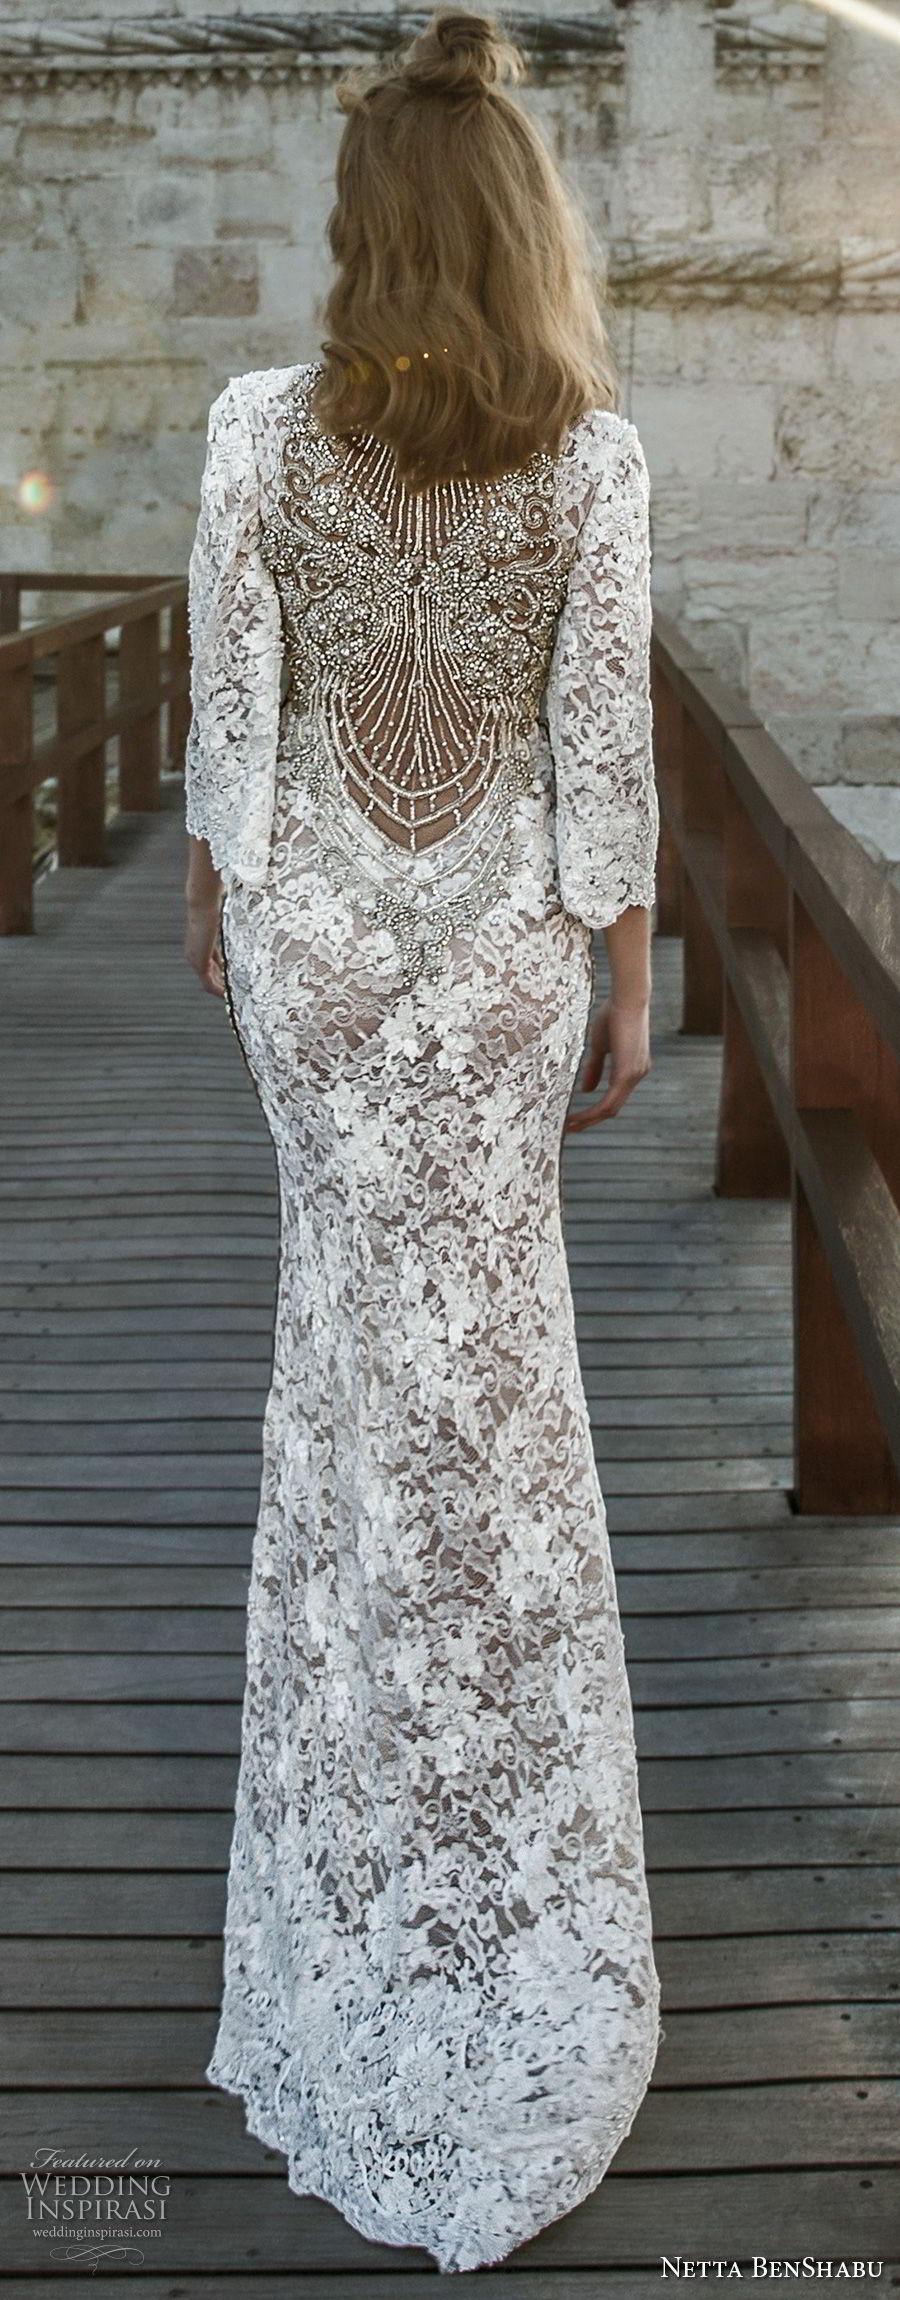 netta benshabu 2017 bridal three quarter sleeves deep v neck full embellishment elegant sexy high slit sheath wedding dress covered lace back sweep train (28) bv